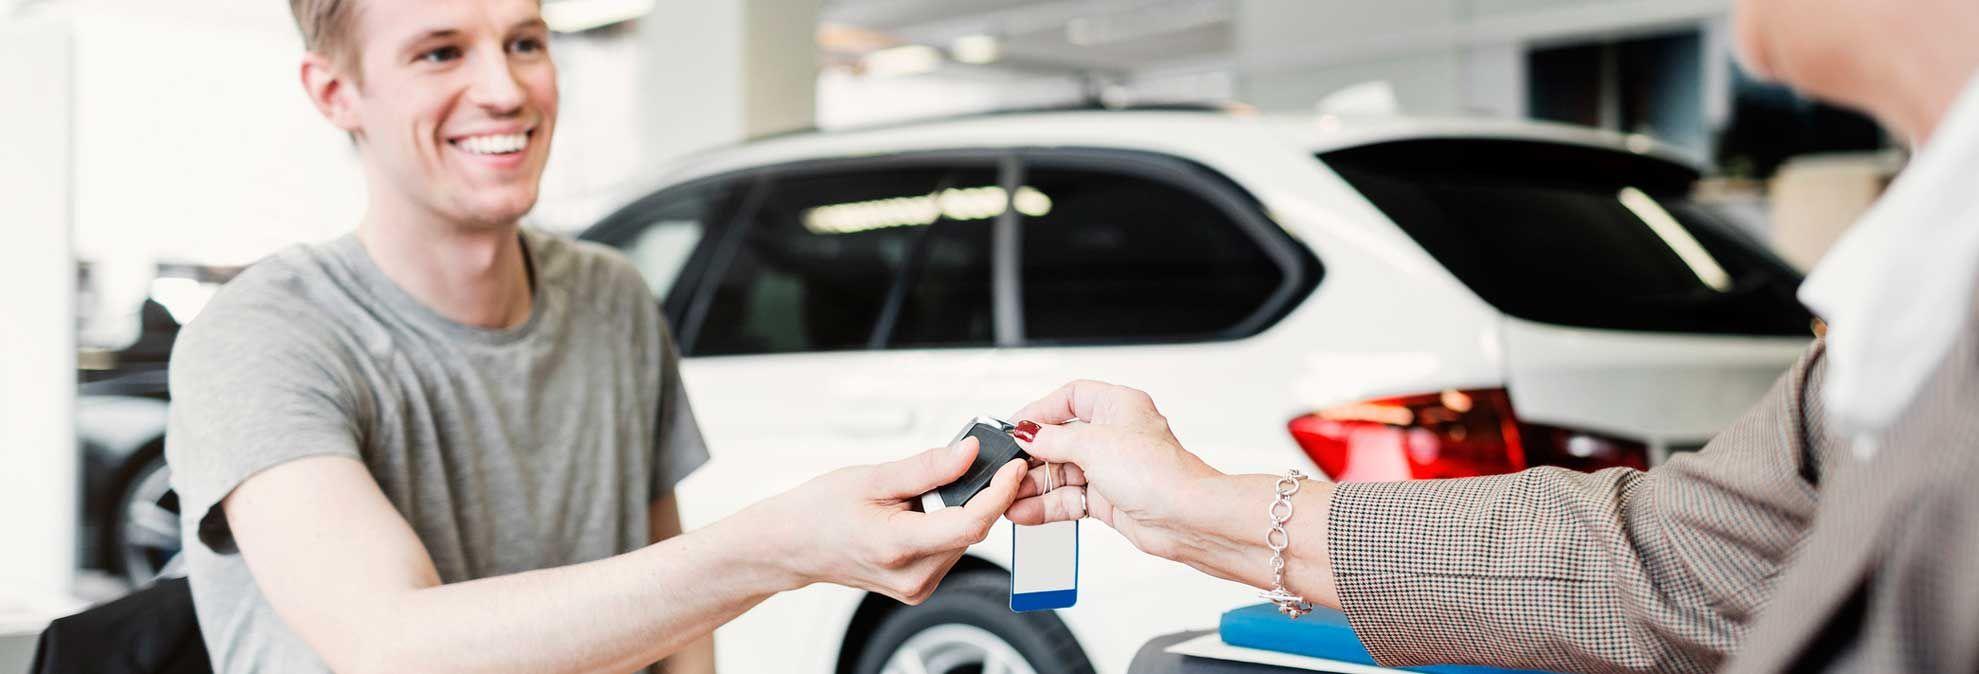 Best New Car Deals Best New Cars Inexpensive Car Insurance Car